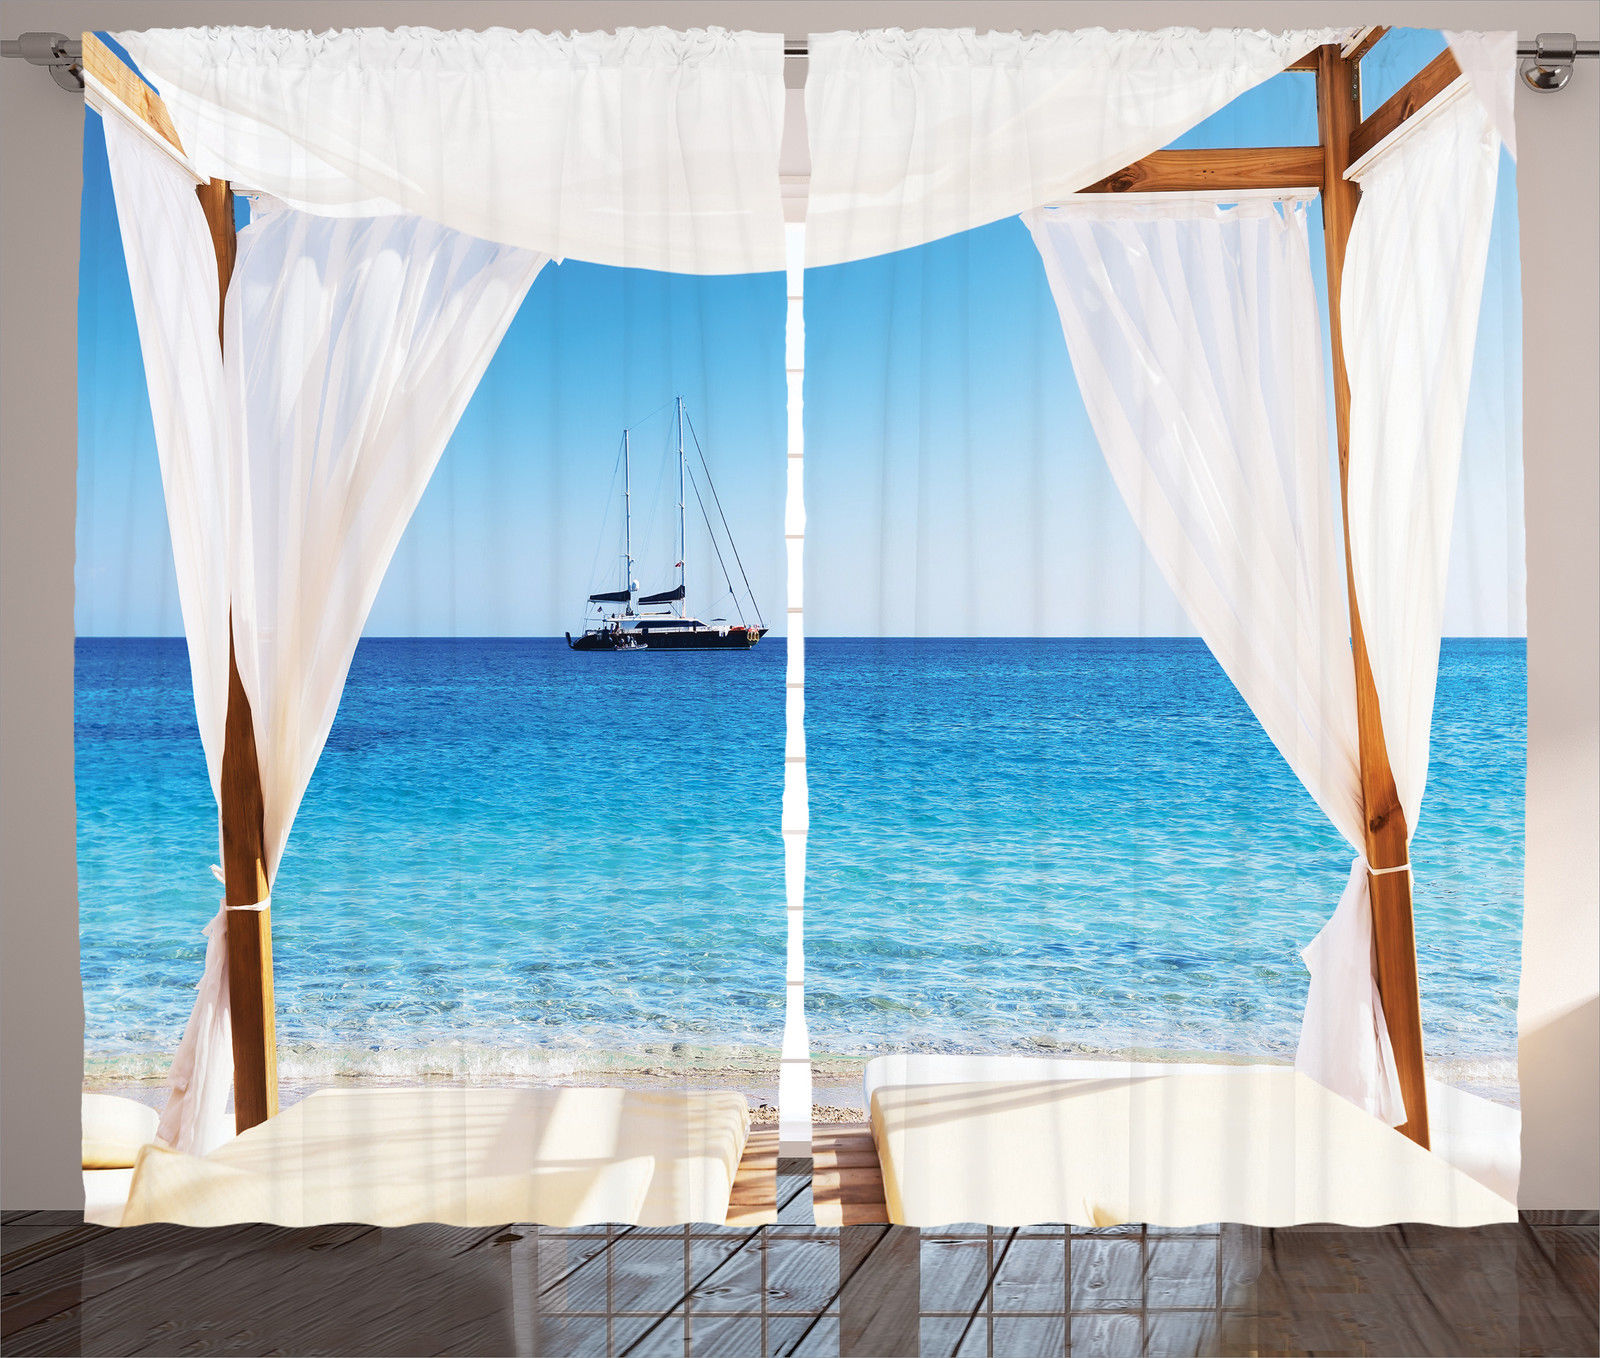 Balinese Beach Pavillion Honeymoon Natural Spa Restort Sea